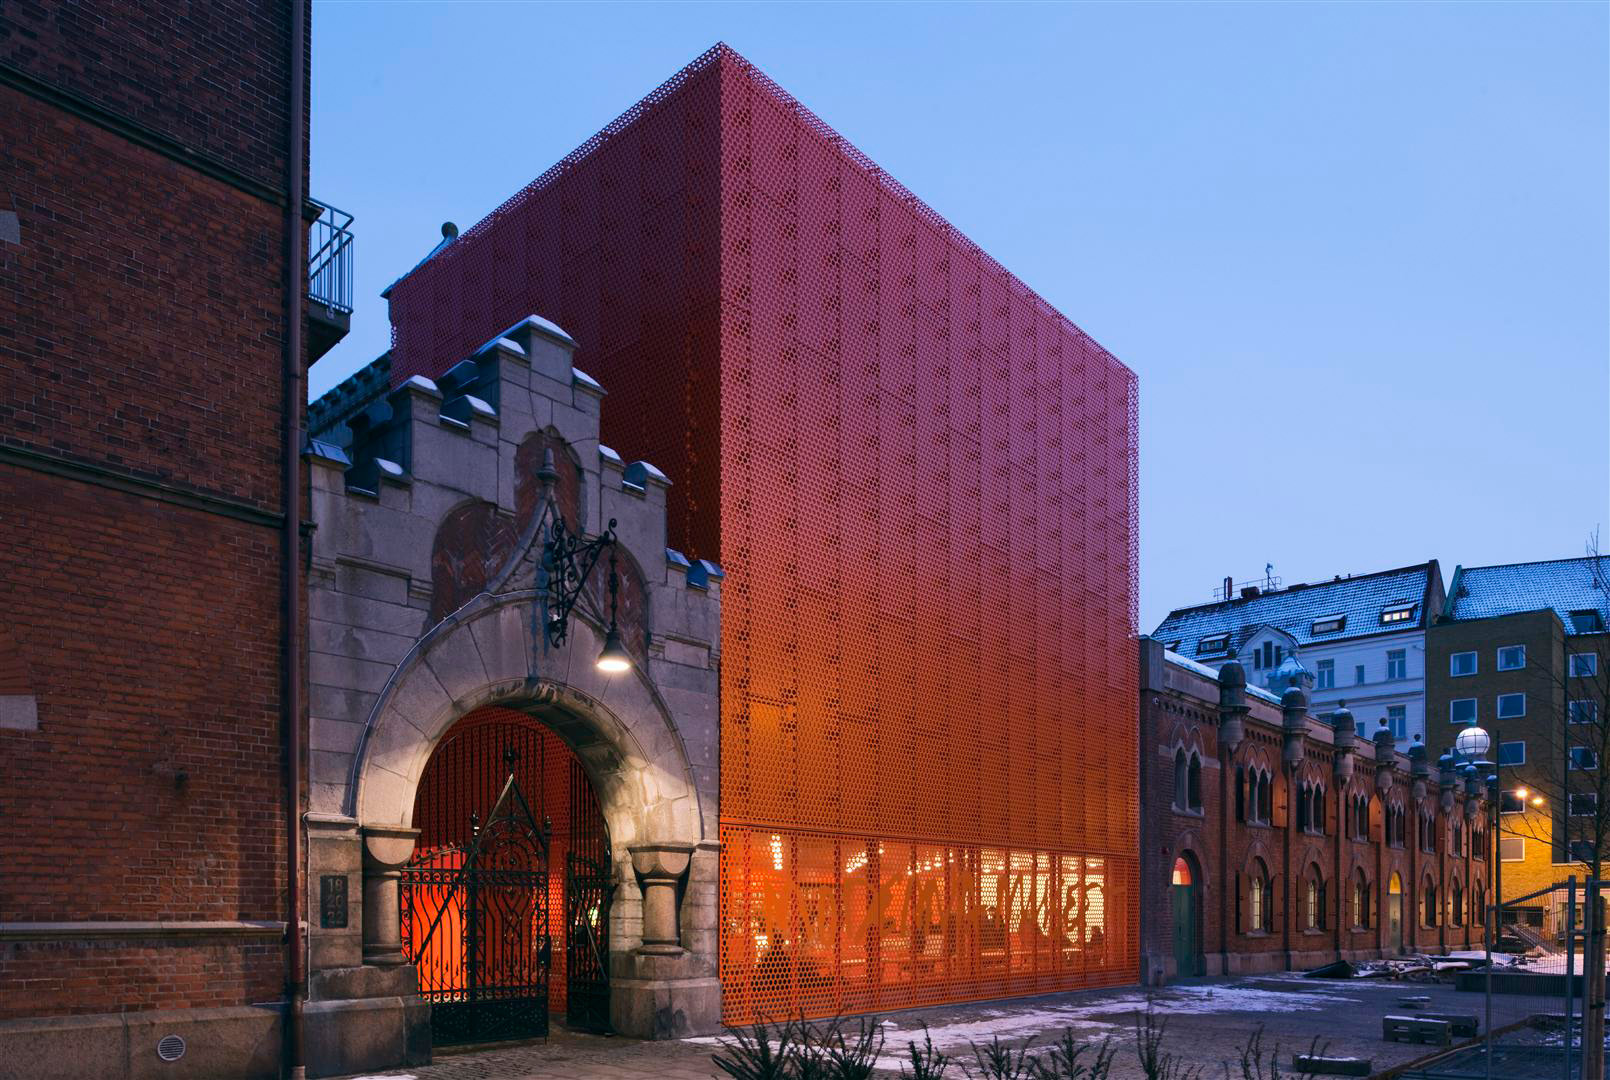 Moderna Museet Malmö / Tham & Videgård Arkitekter, © Åke E:son Lindman